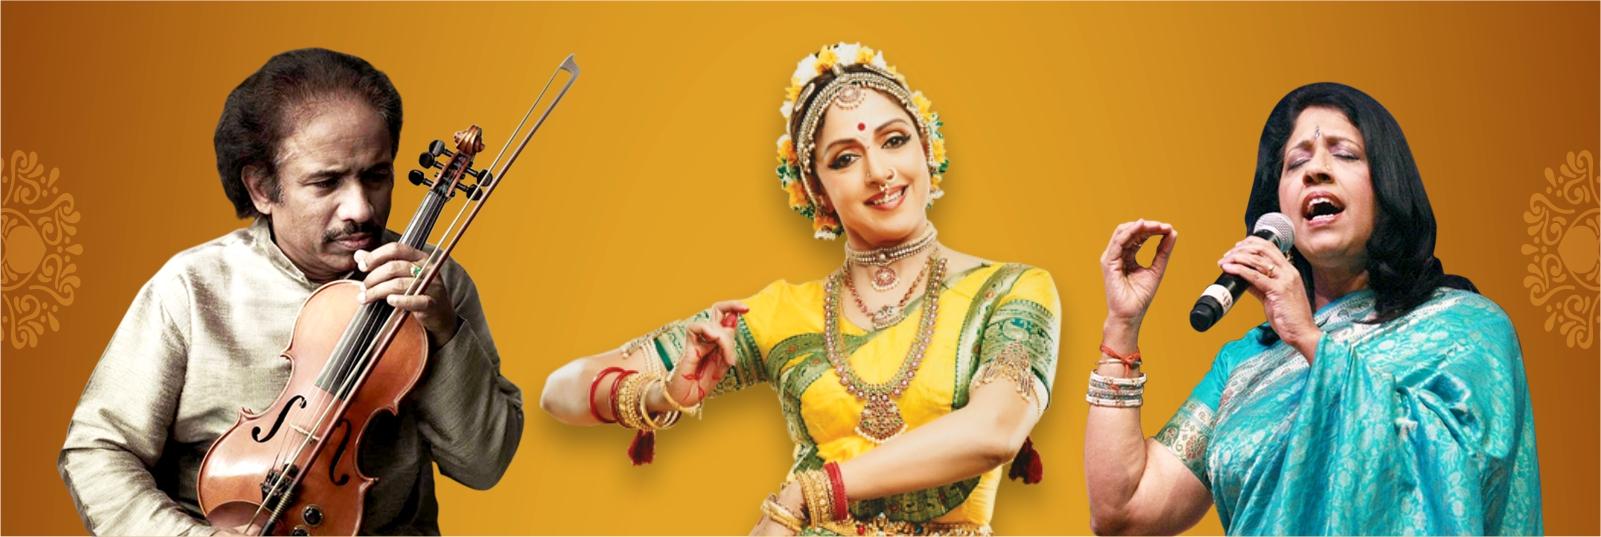 SOLD OUT!!! - Hema Malini, L. Subramaniam & Kavita Krishnamurthy Live in Concert